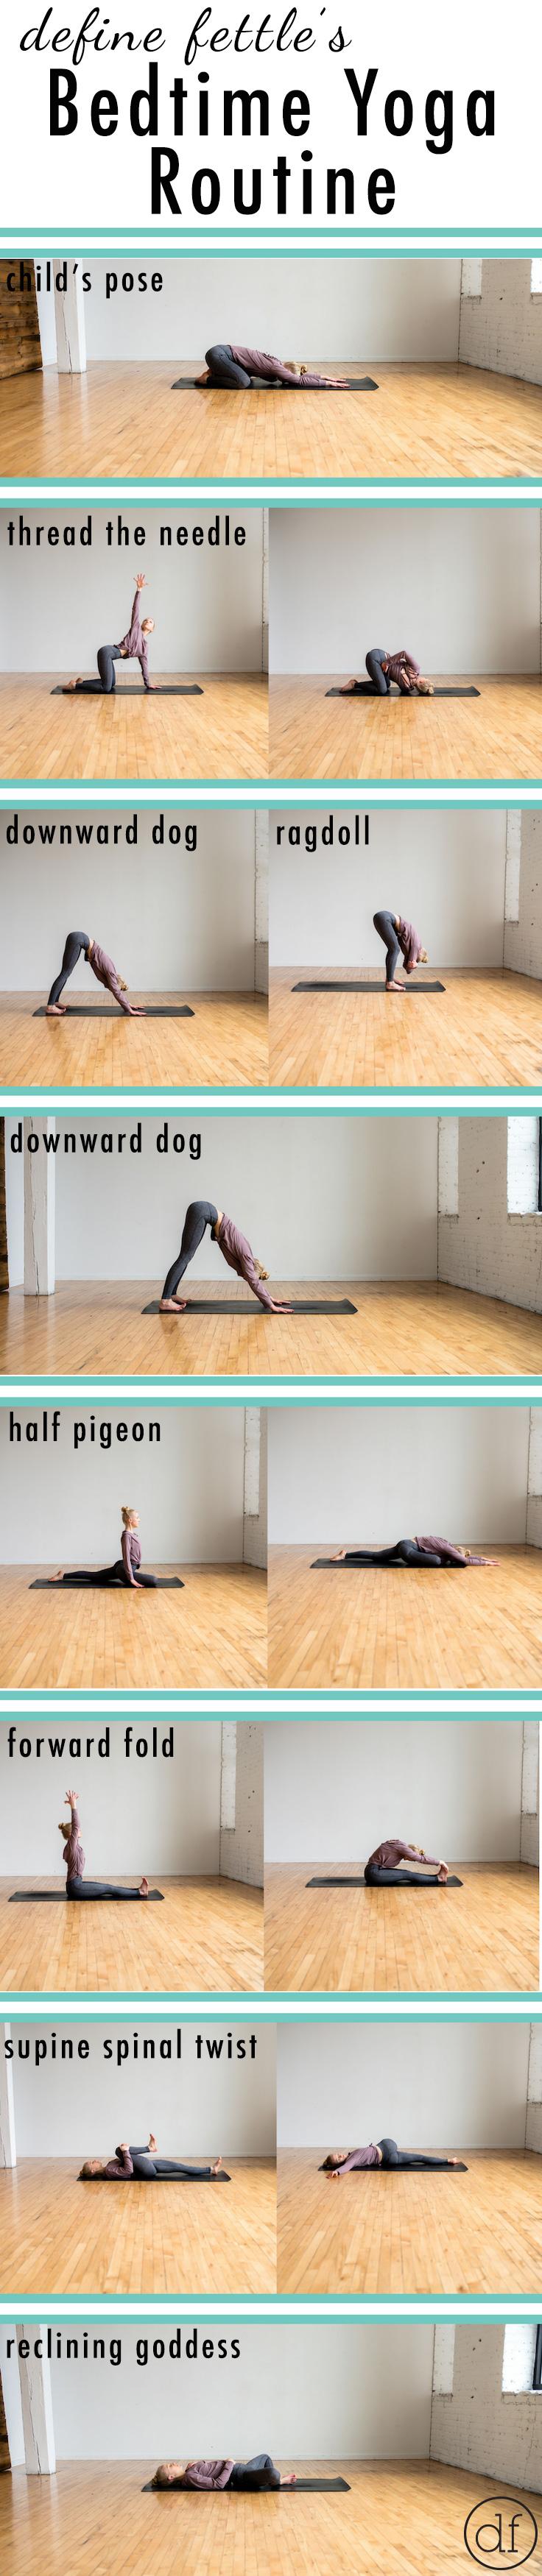 Bedtime Yoga Routine, Define Fettle, Yoga Poses, Bedtime Yoga, Yoga Routine, Beginner Yoga, Relaxation Yoga, Yoga Blogger, Fitness Blogger,